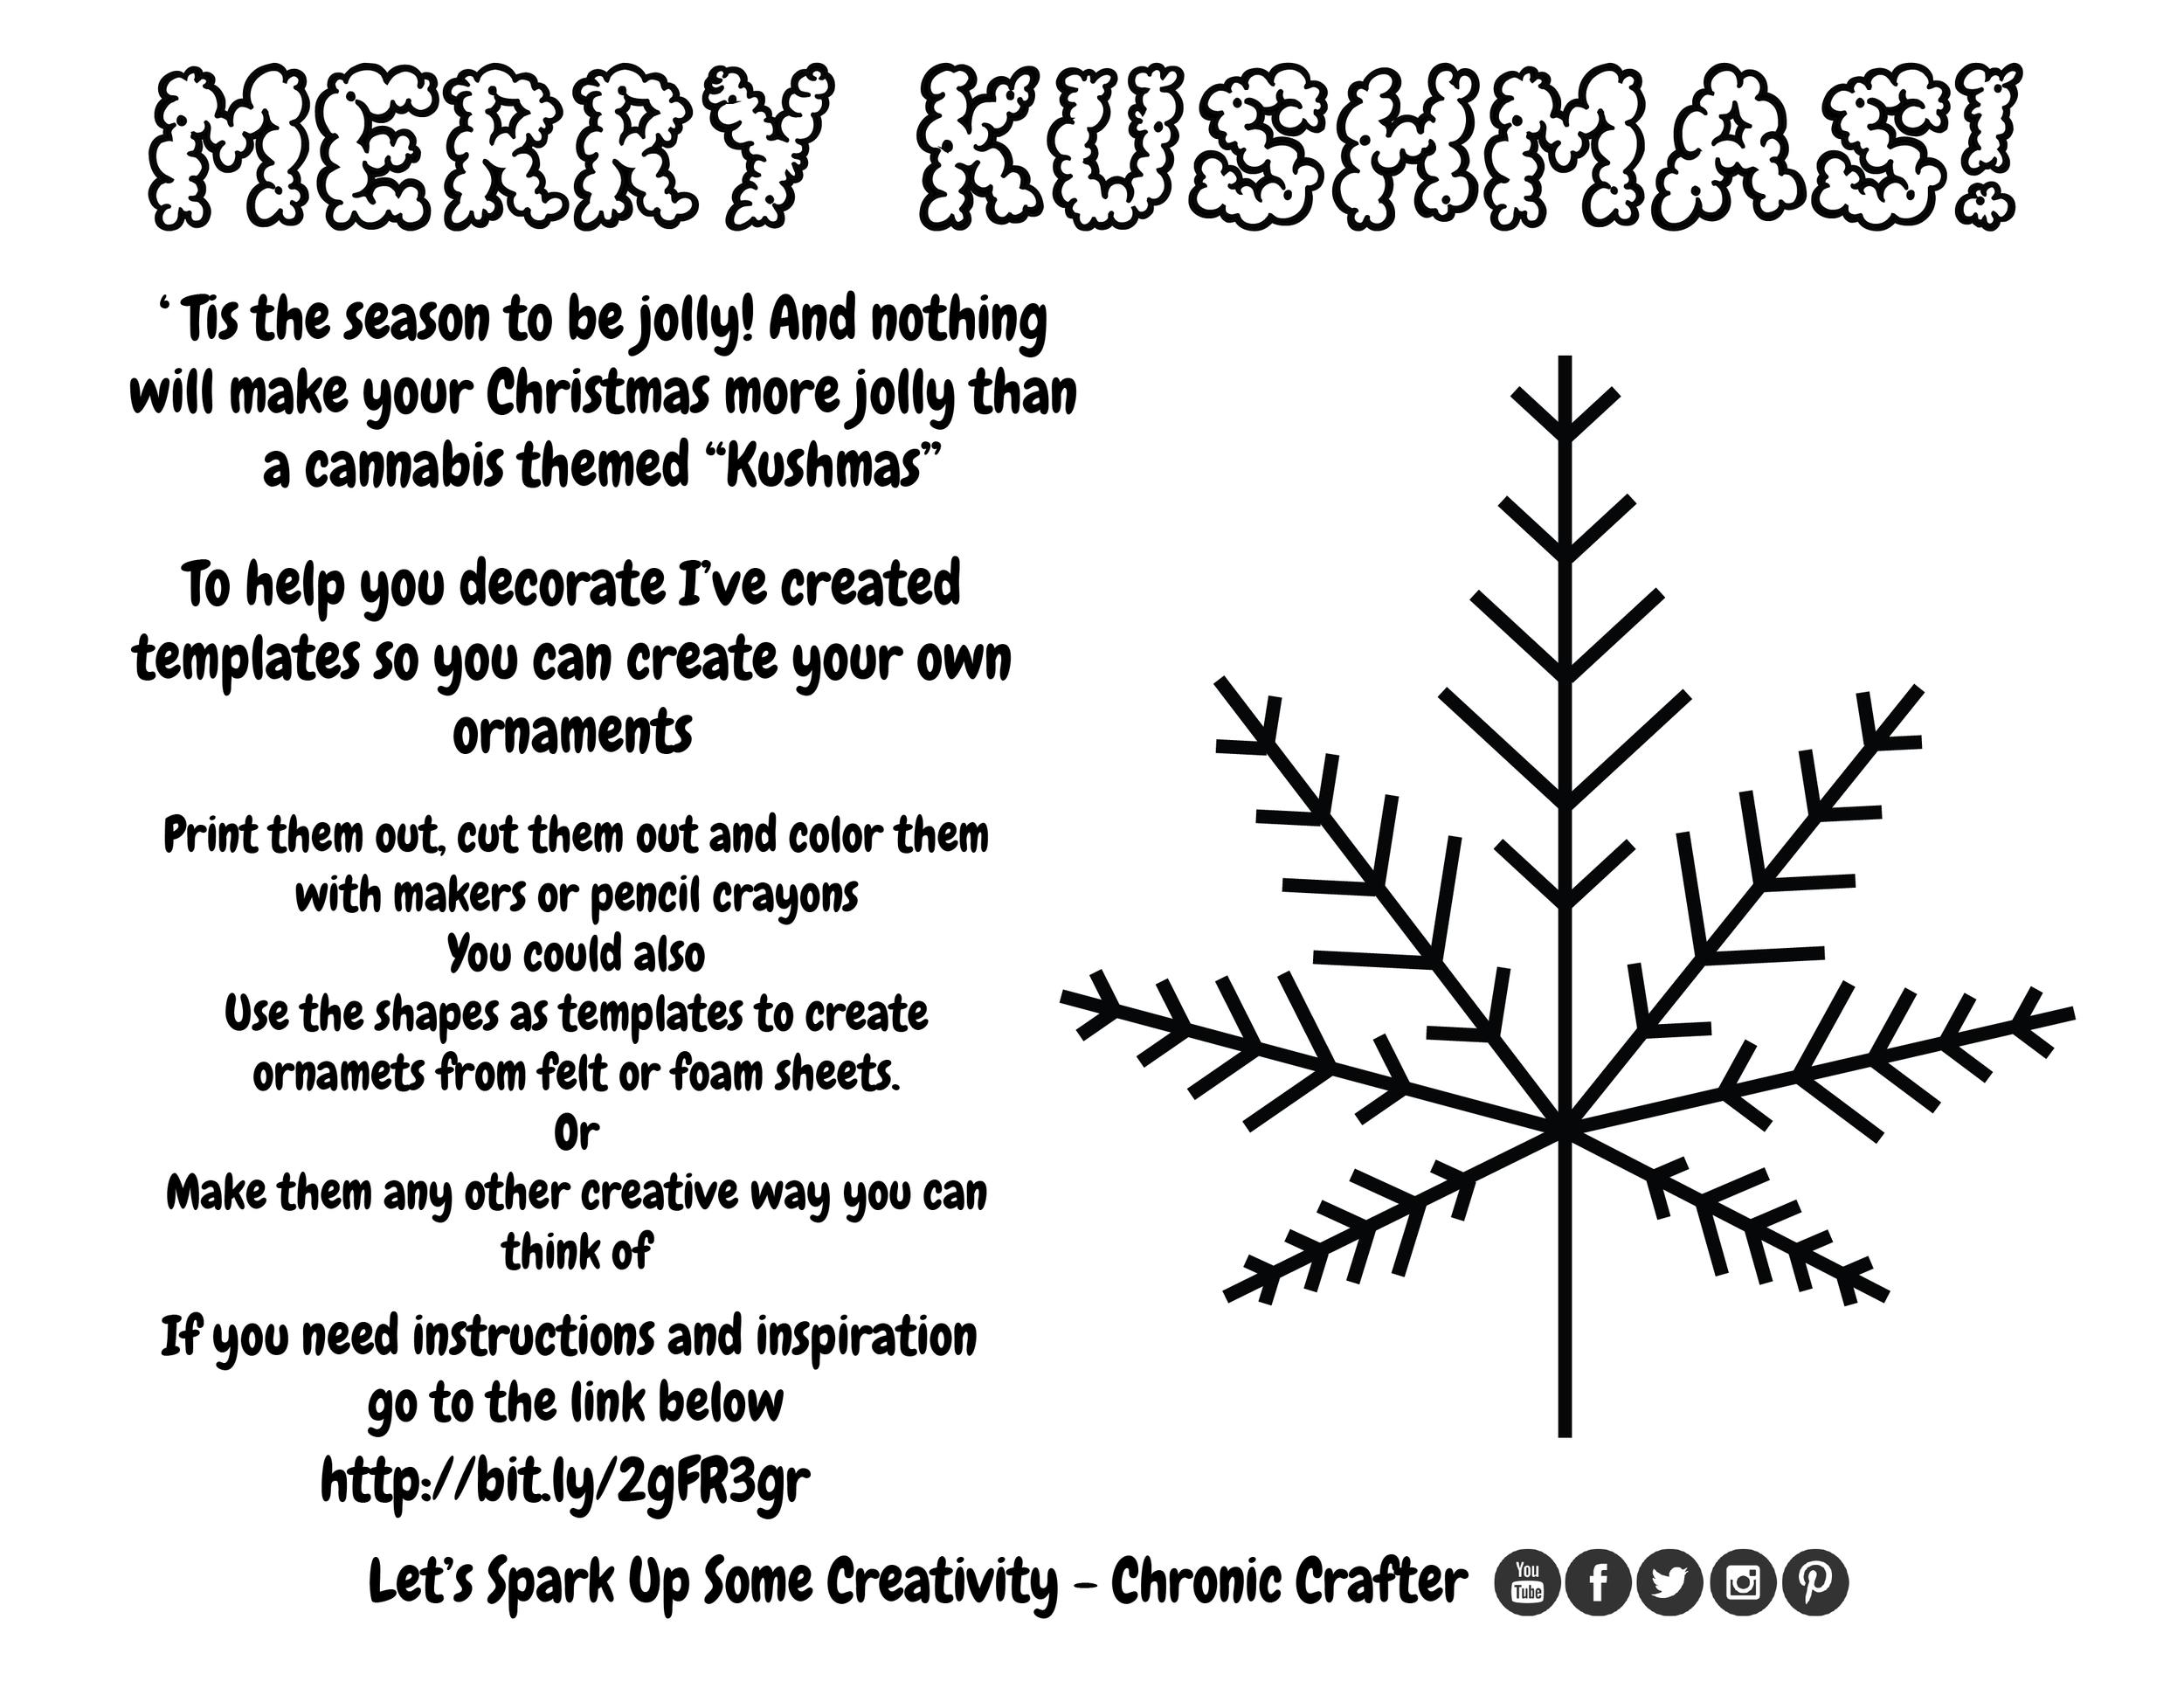 DIY Marijuana Themed Christmas (Kushmas) Ornaments a Reefer DIY